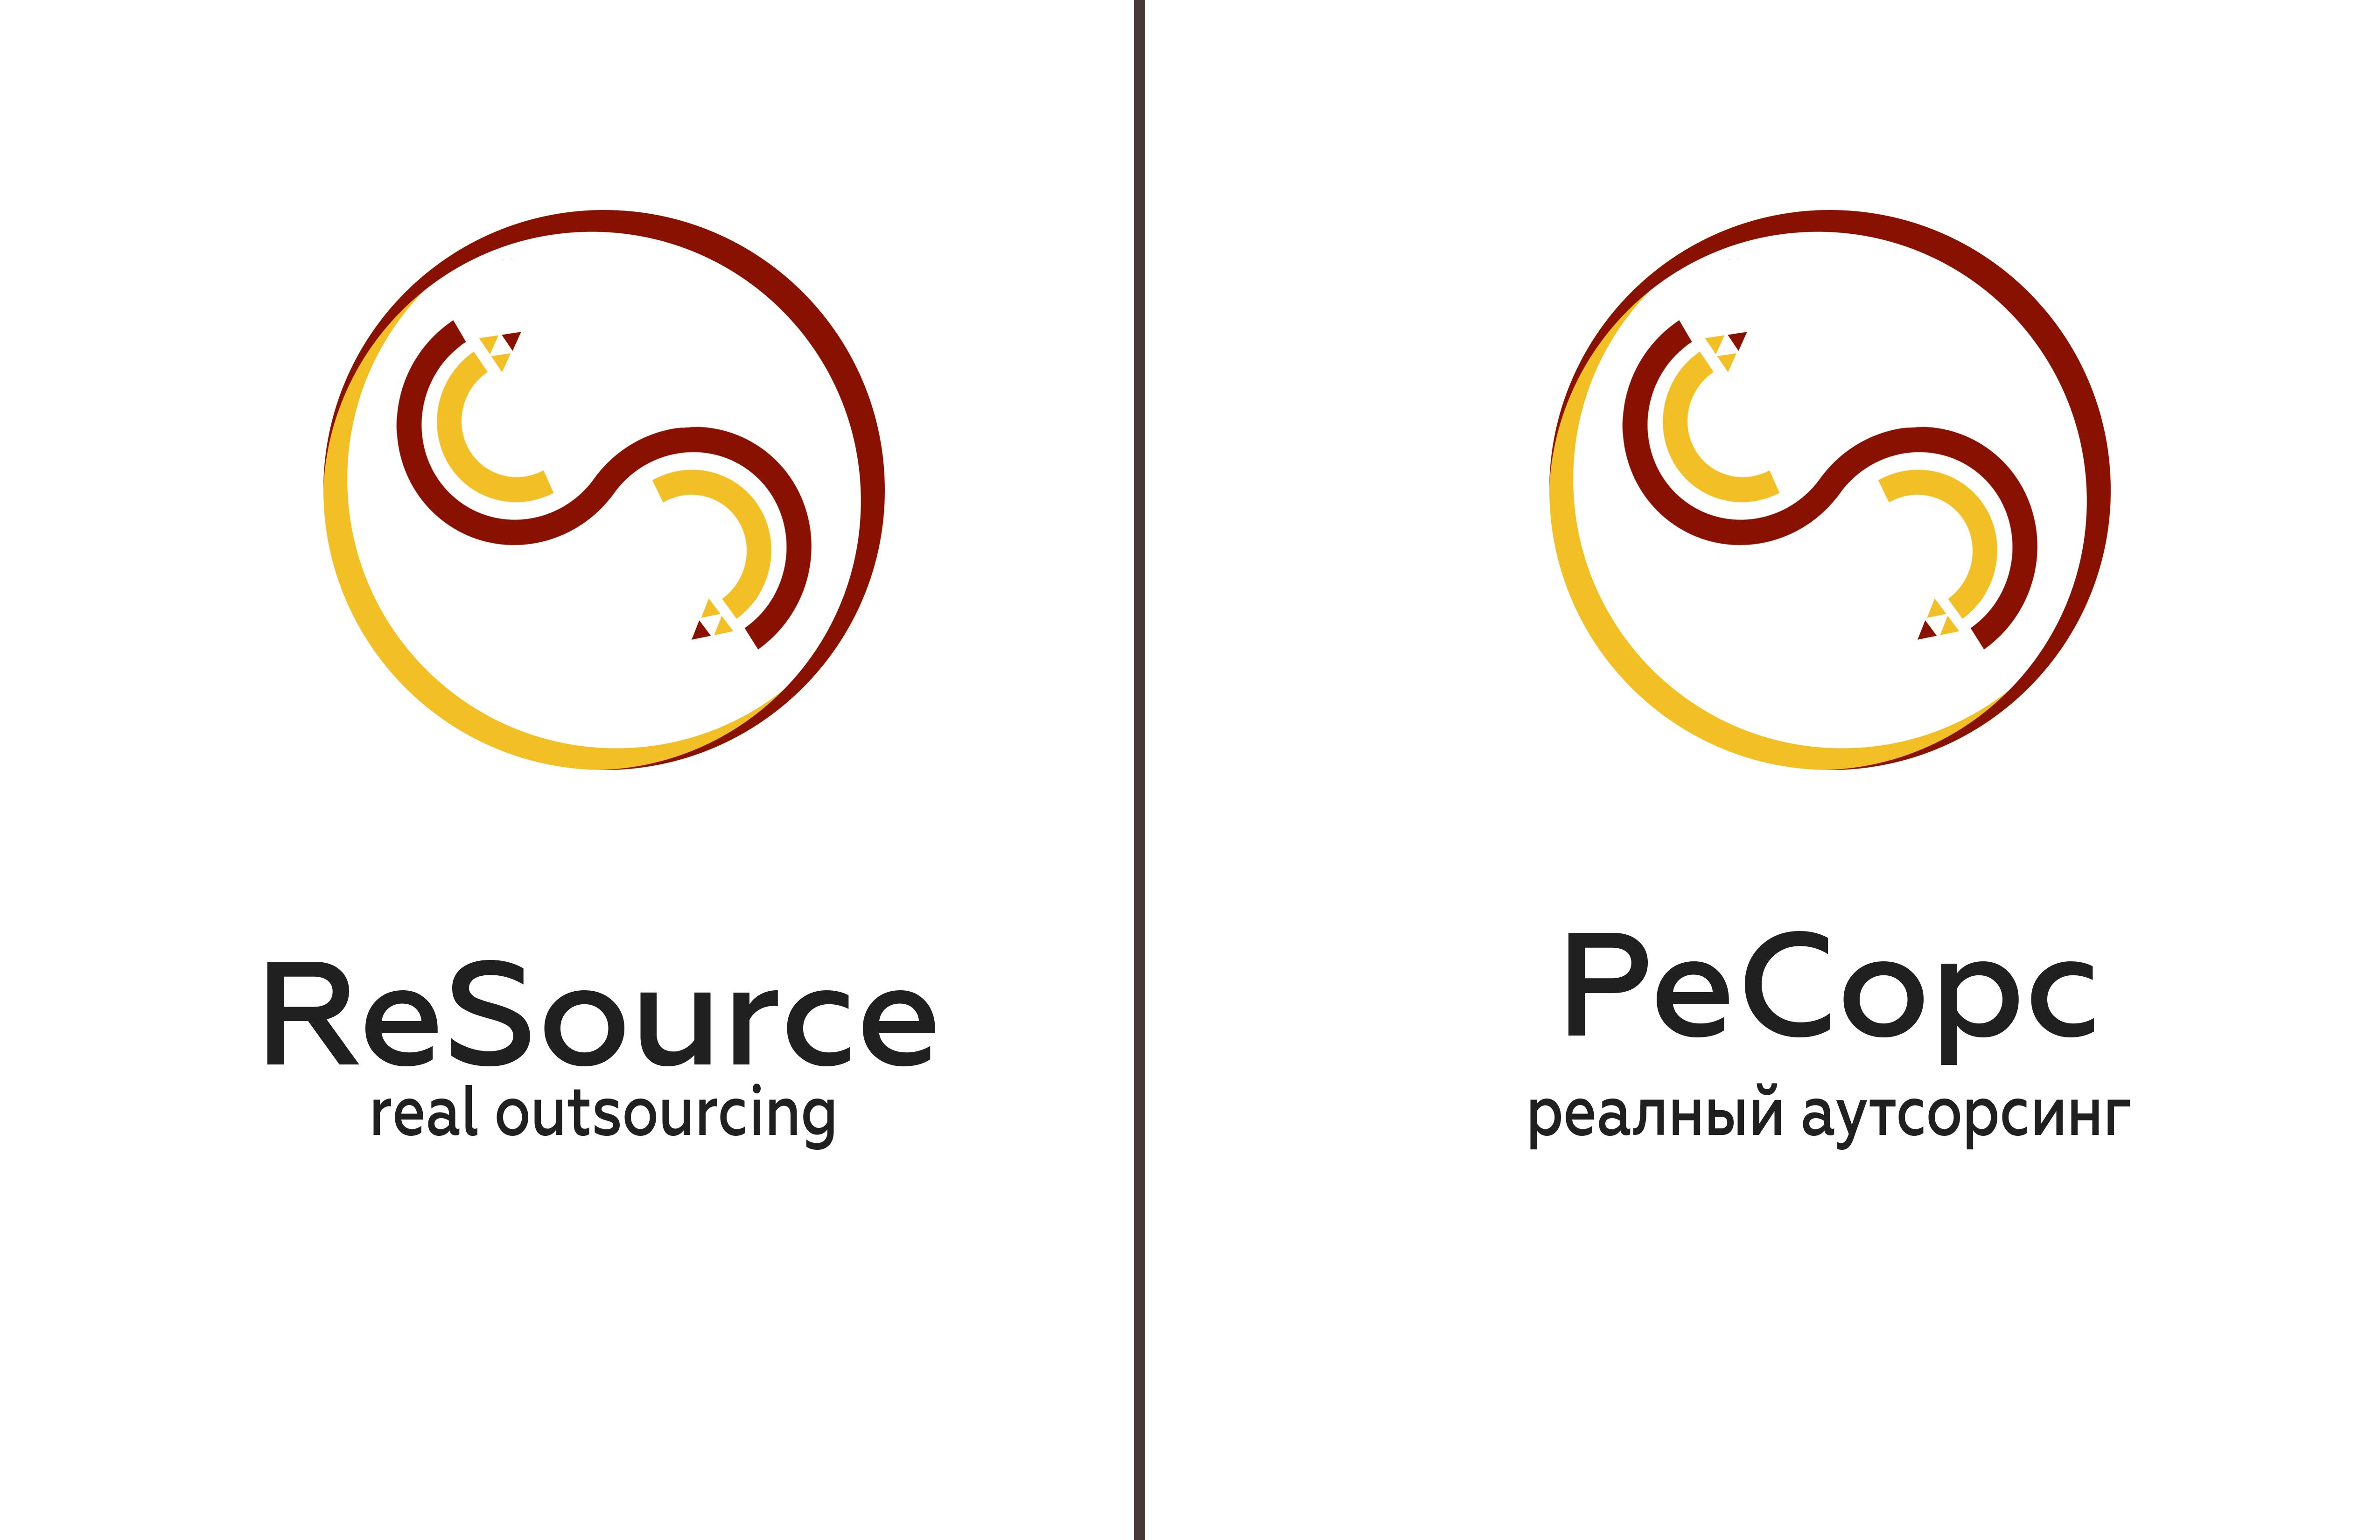 Нейминг и логотип компании, занимающейся аутсорсингом фото f_22659d9314fb0e55.png